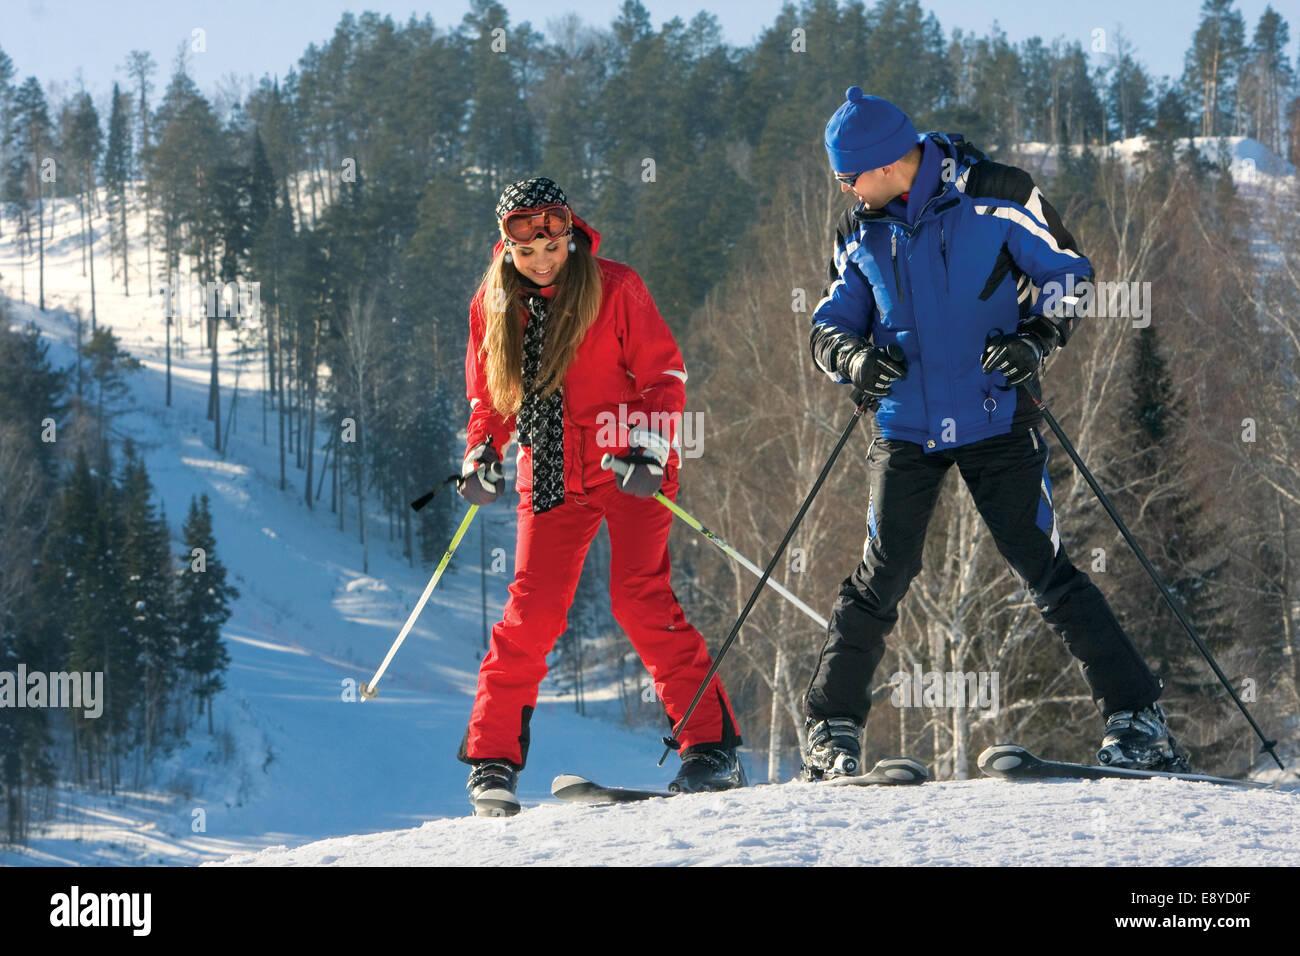 Learning to ski. - Stock Image